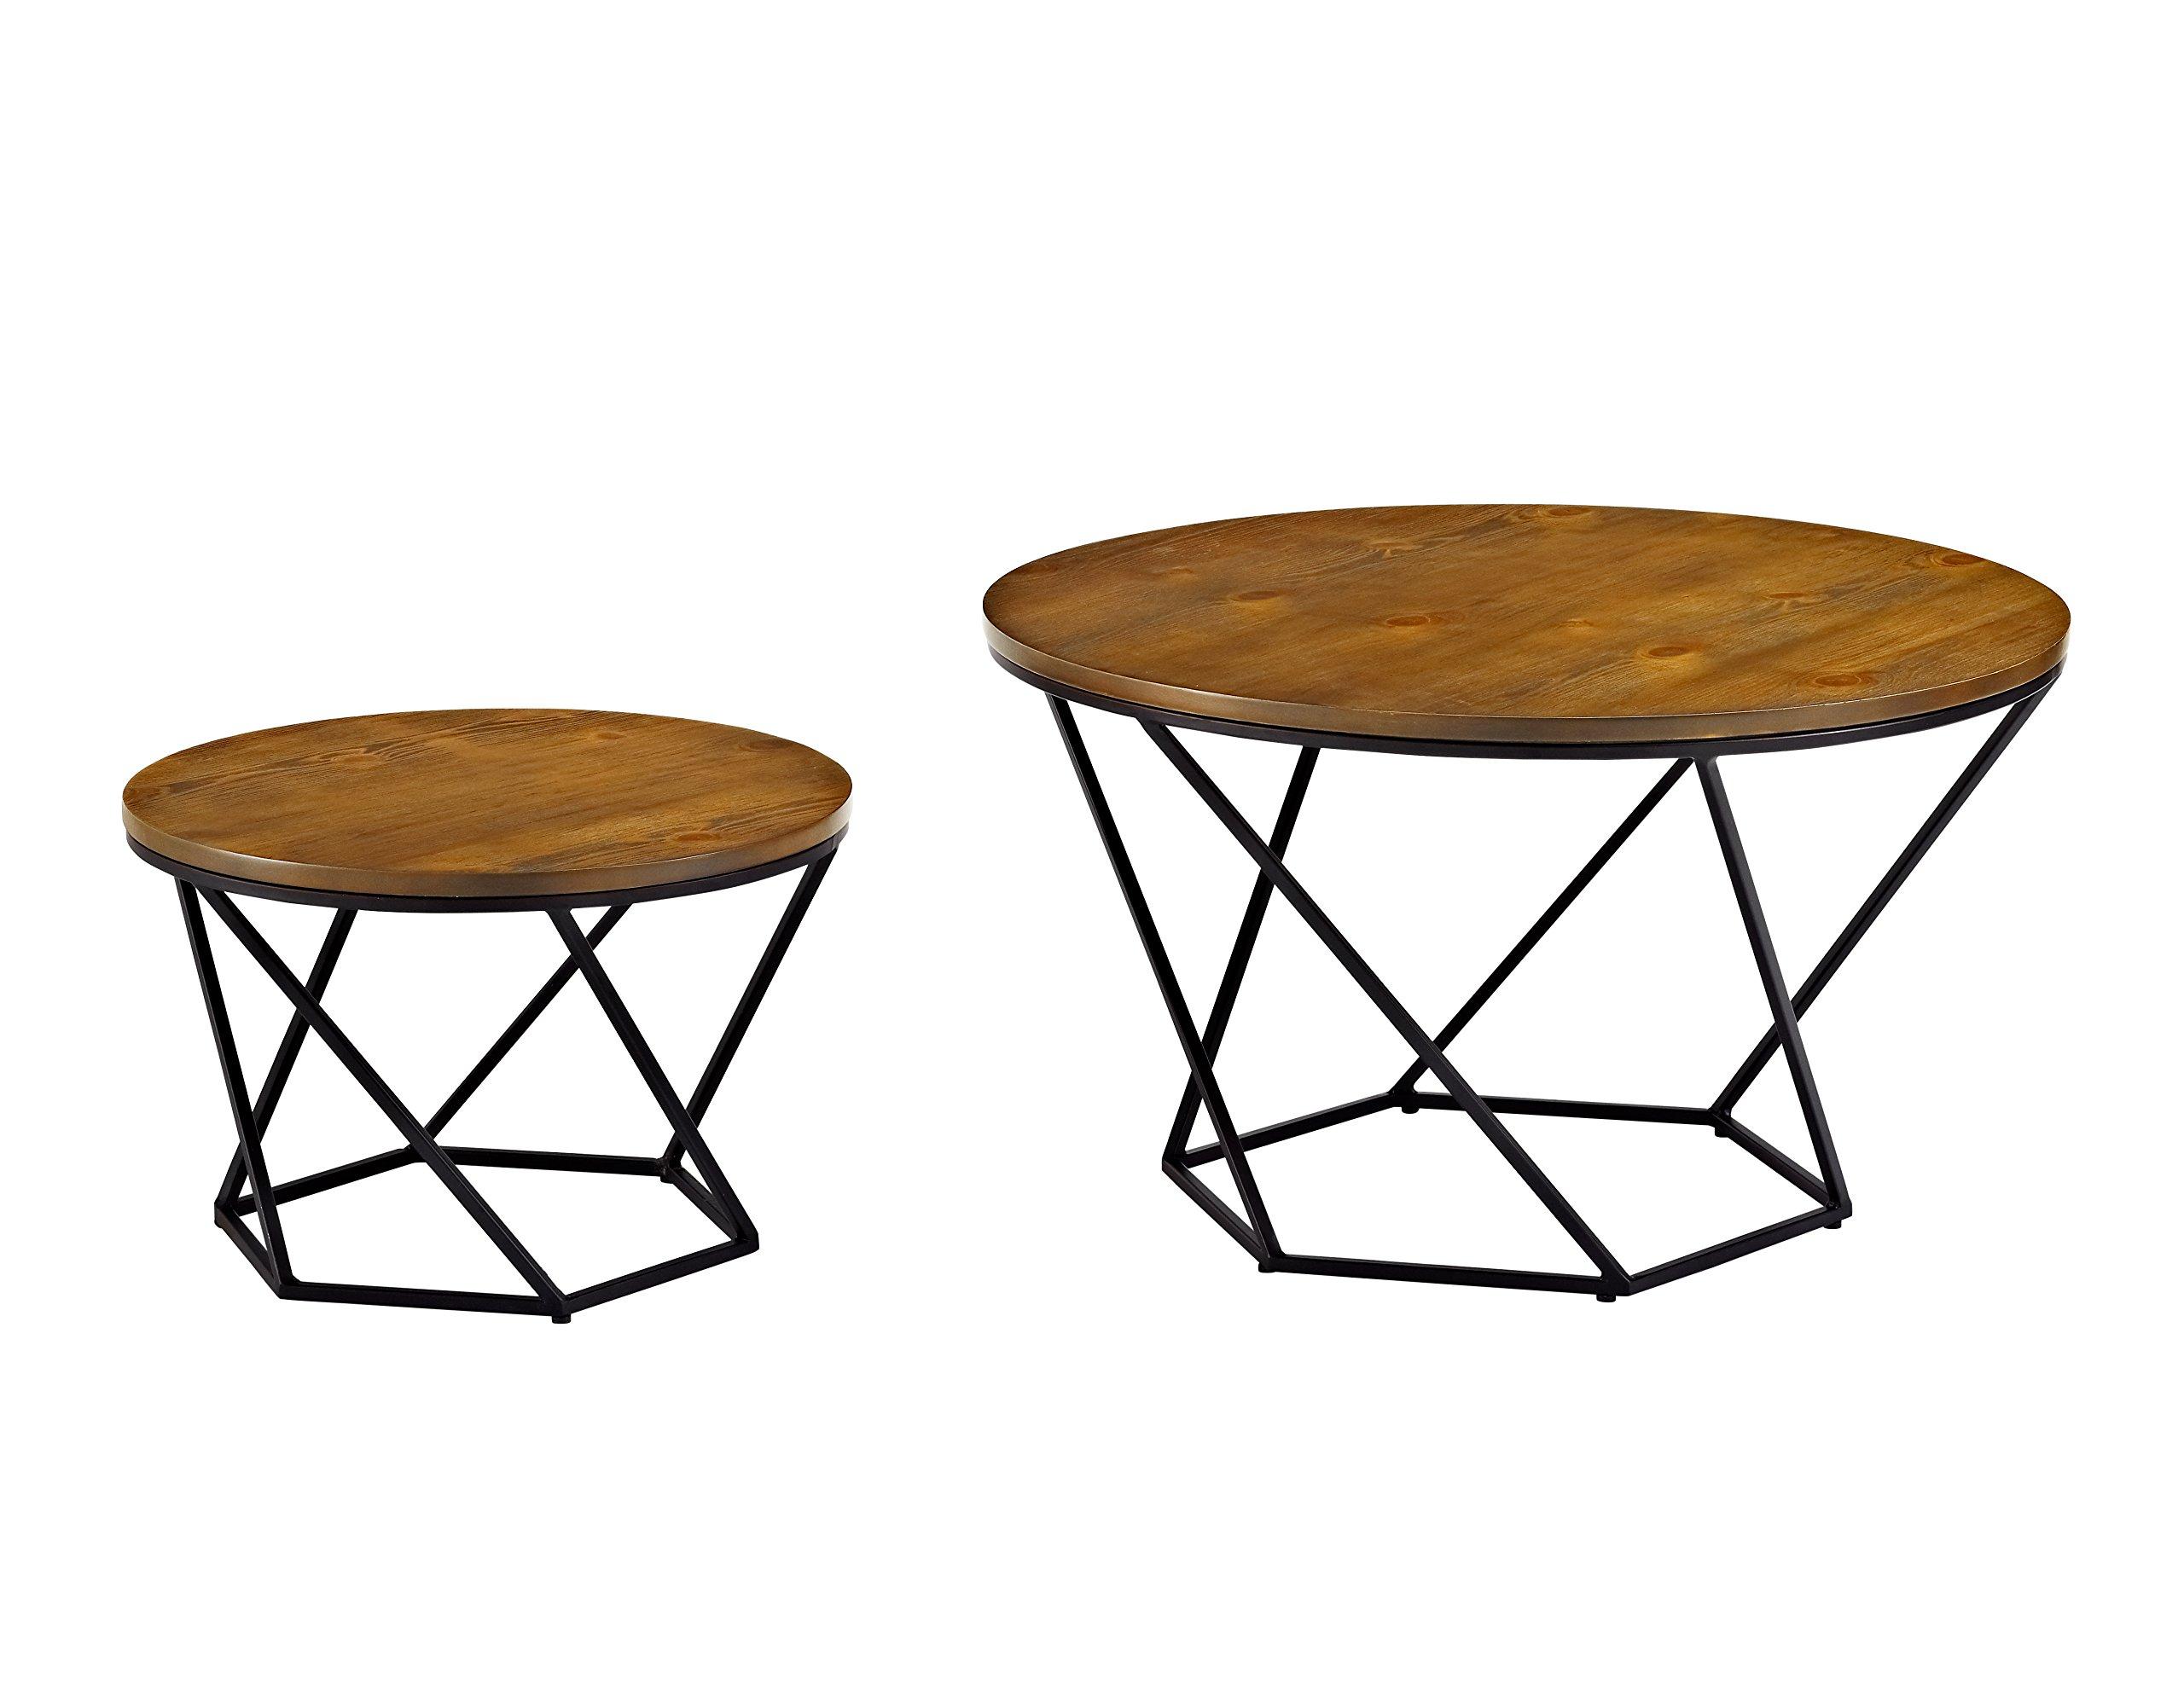 WE Furniture Geometric Wood Nesting Coffee Tables - Oak/Black by WE Furniture (Image #3)